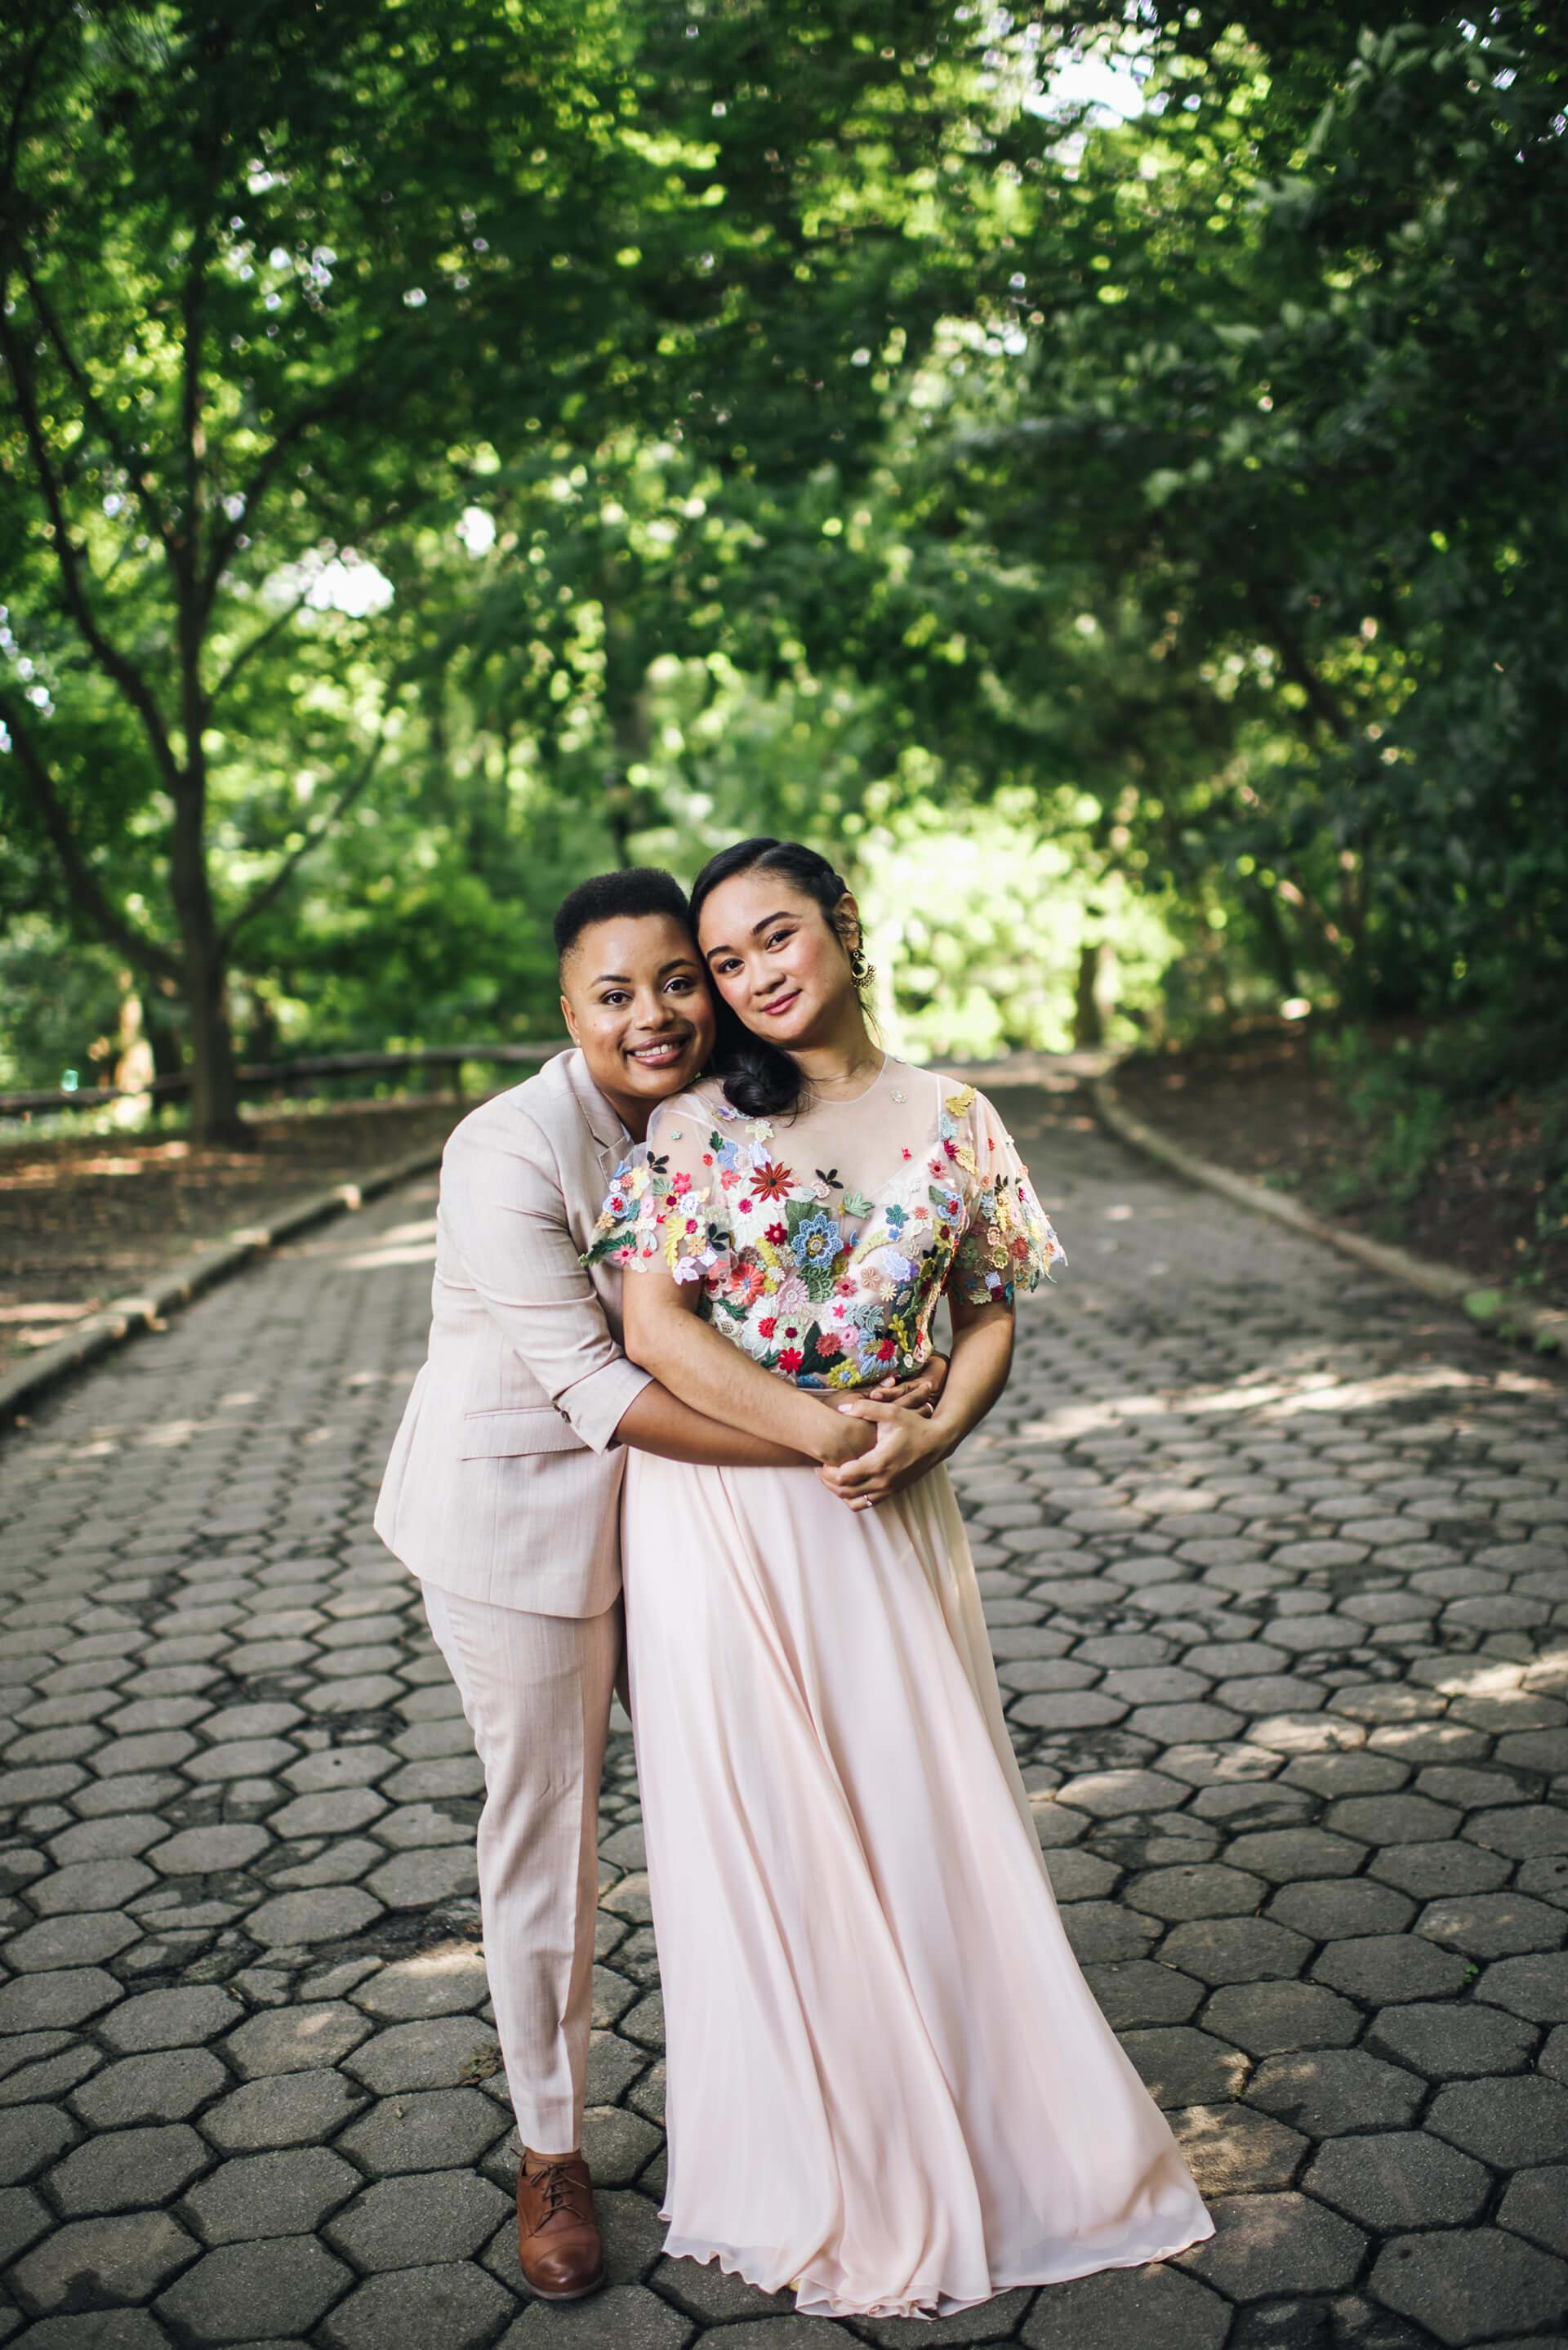 BROOKLYN SOCIETY FOR ETHICAL CULTURE - INTIMATE WEDDING - CHI-CHI ARI-94 (1).jpg